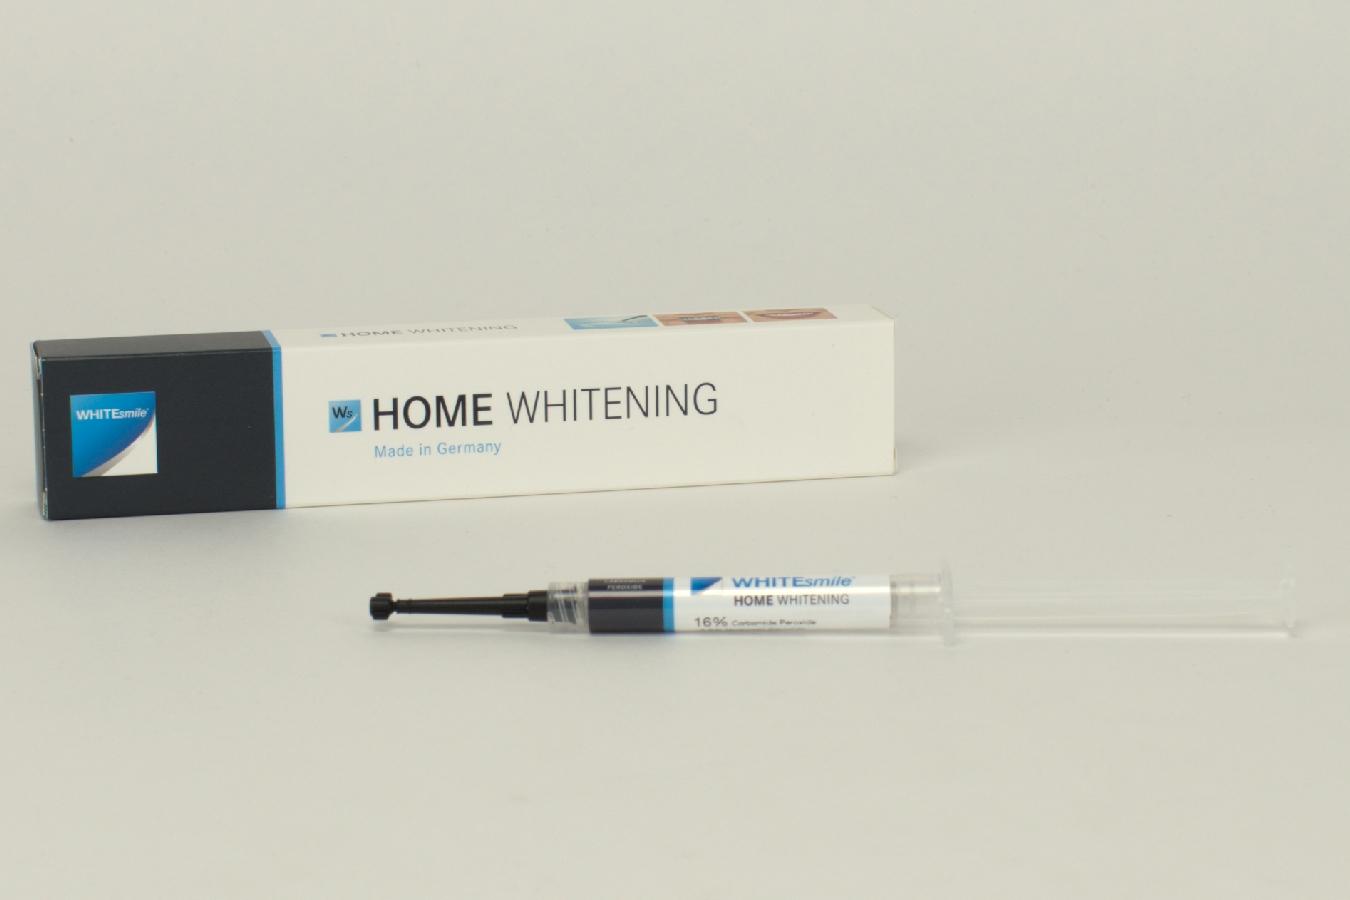 White Smile Tooth Whit-Gel 16% 1Spr